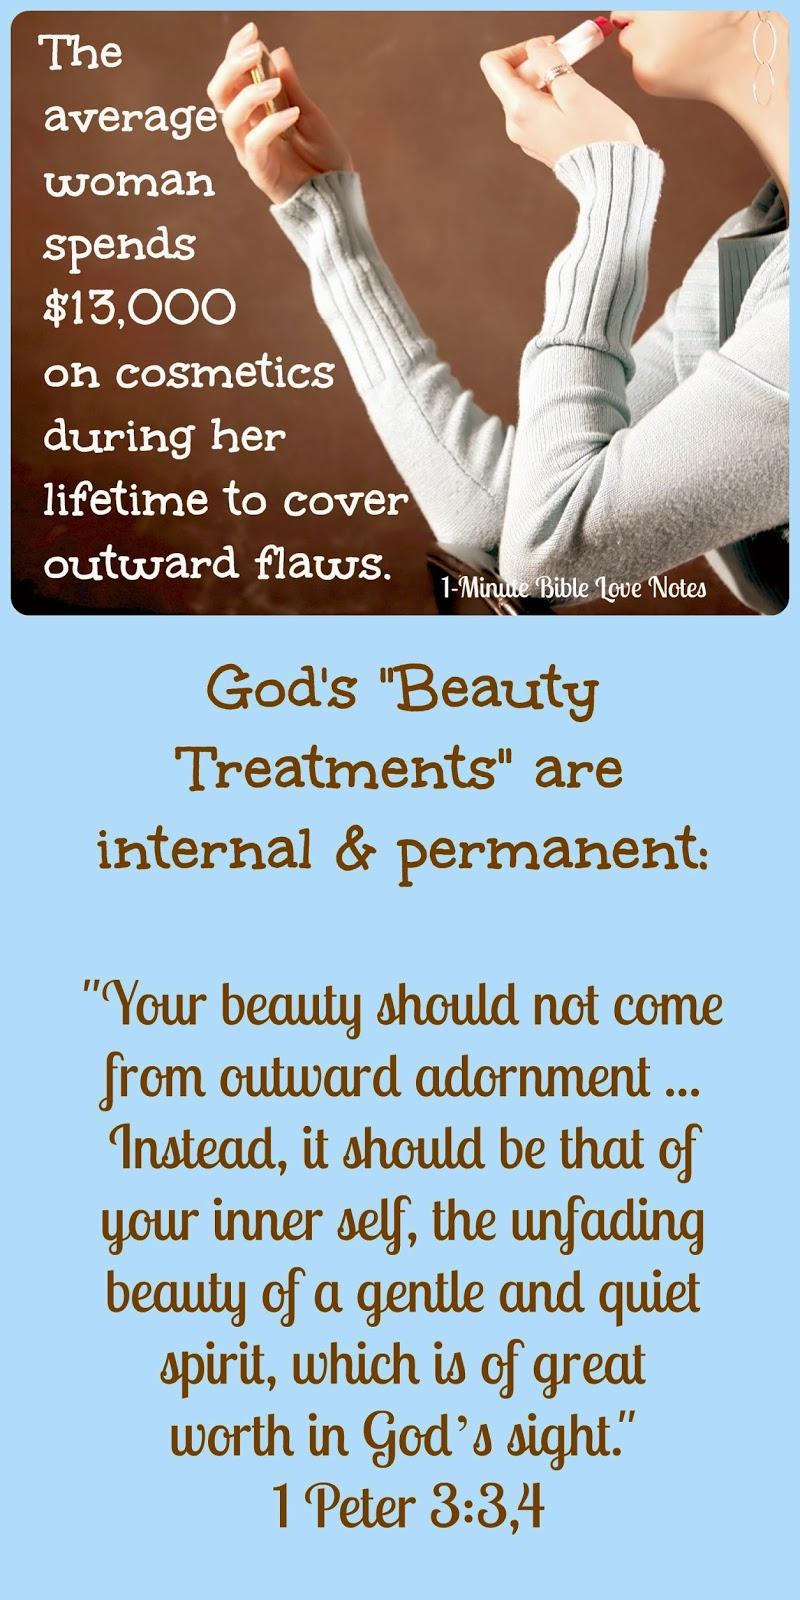 4 Inner Beauty Treatments - God Changes Hearts